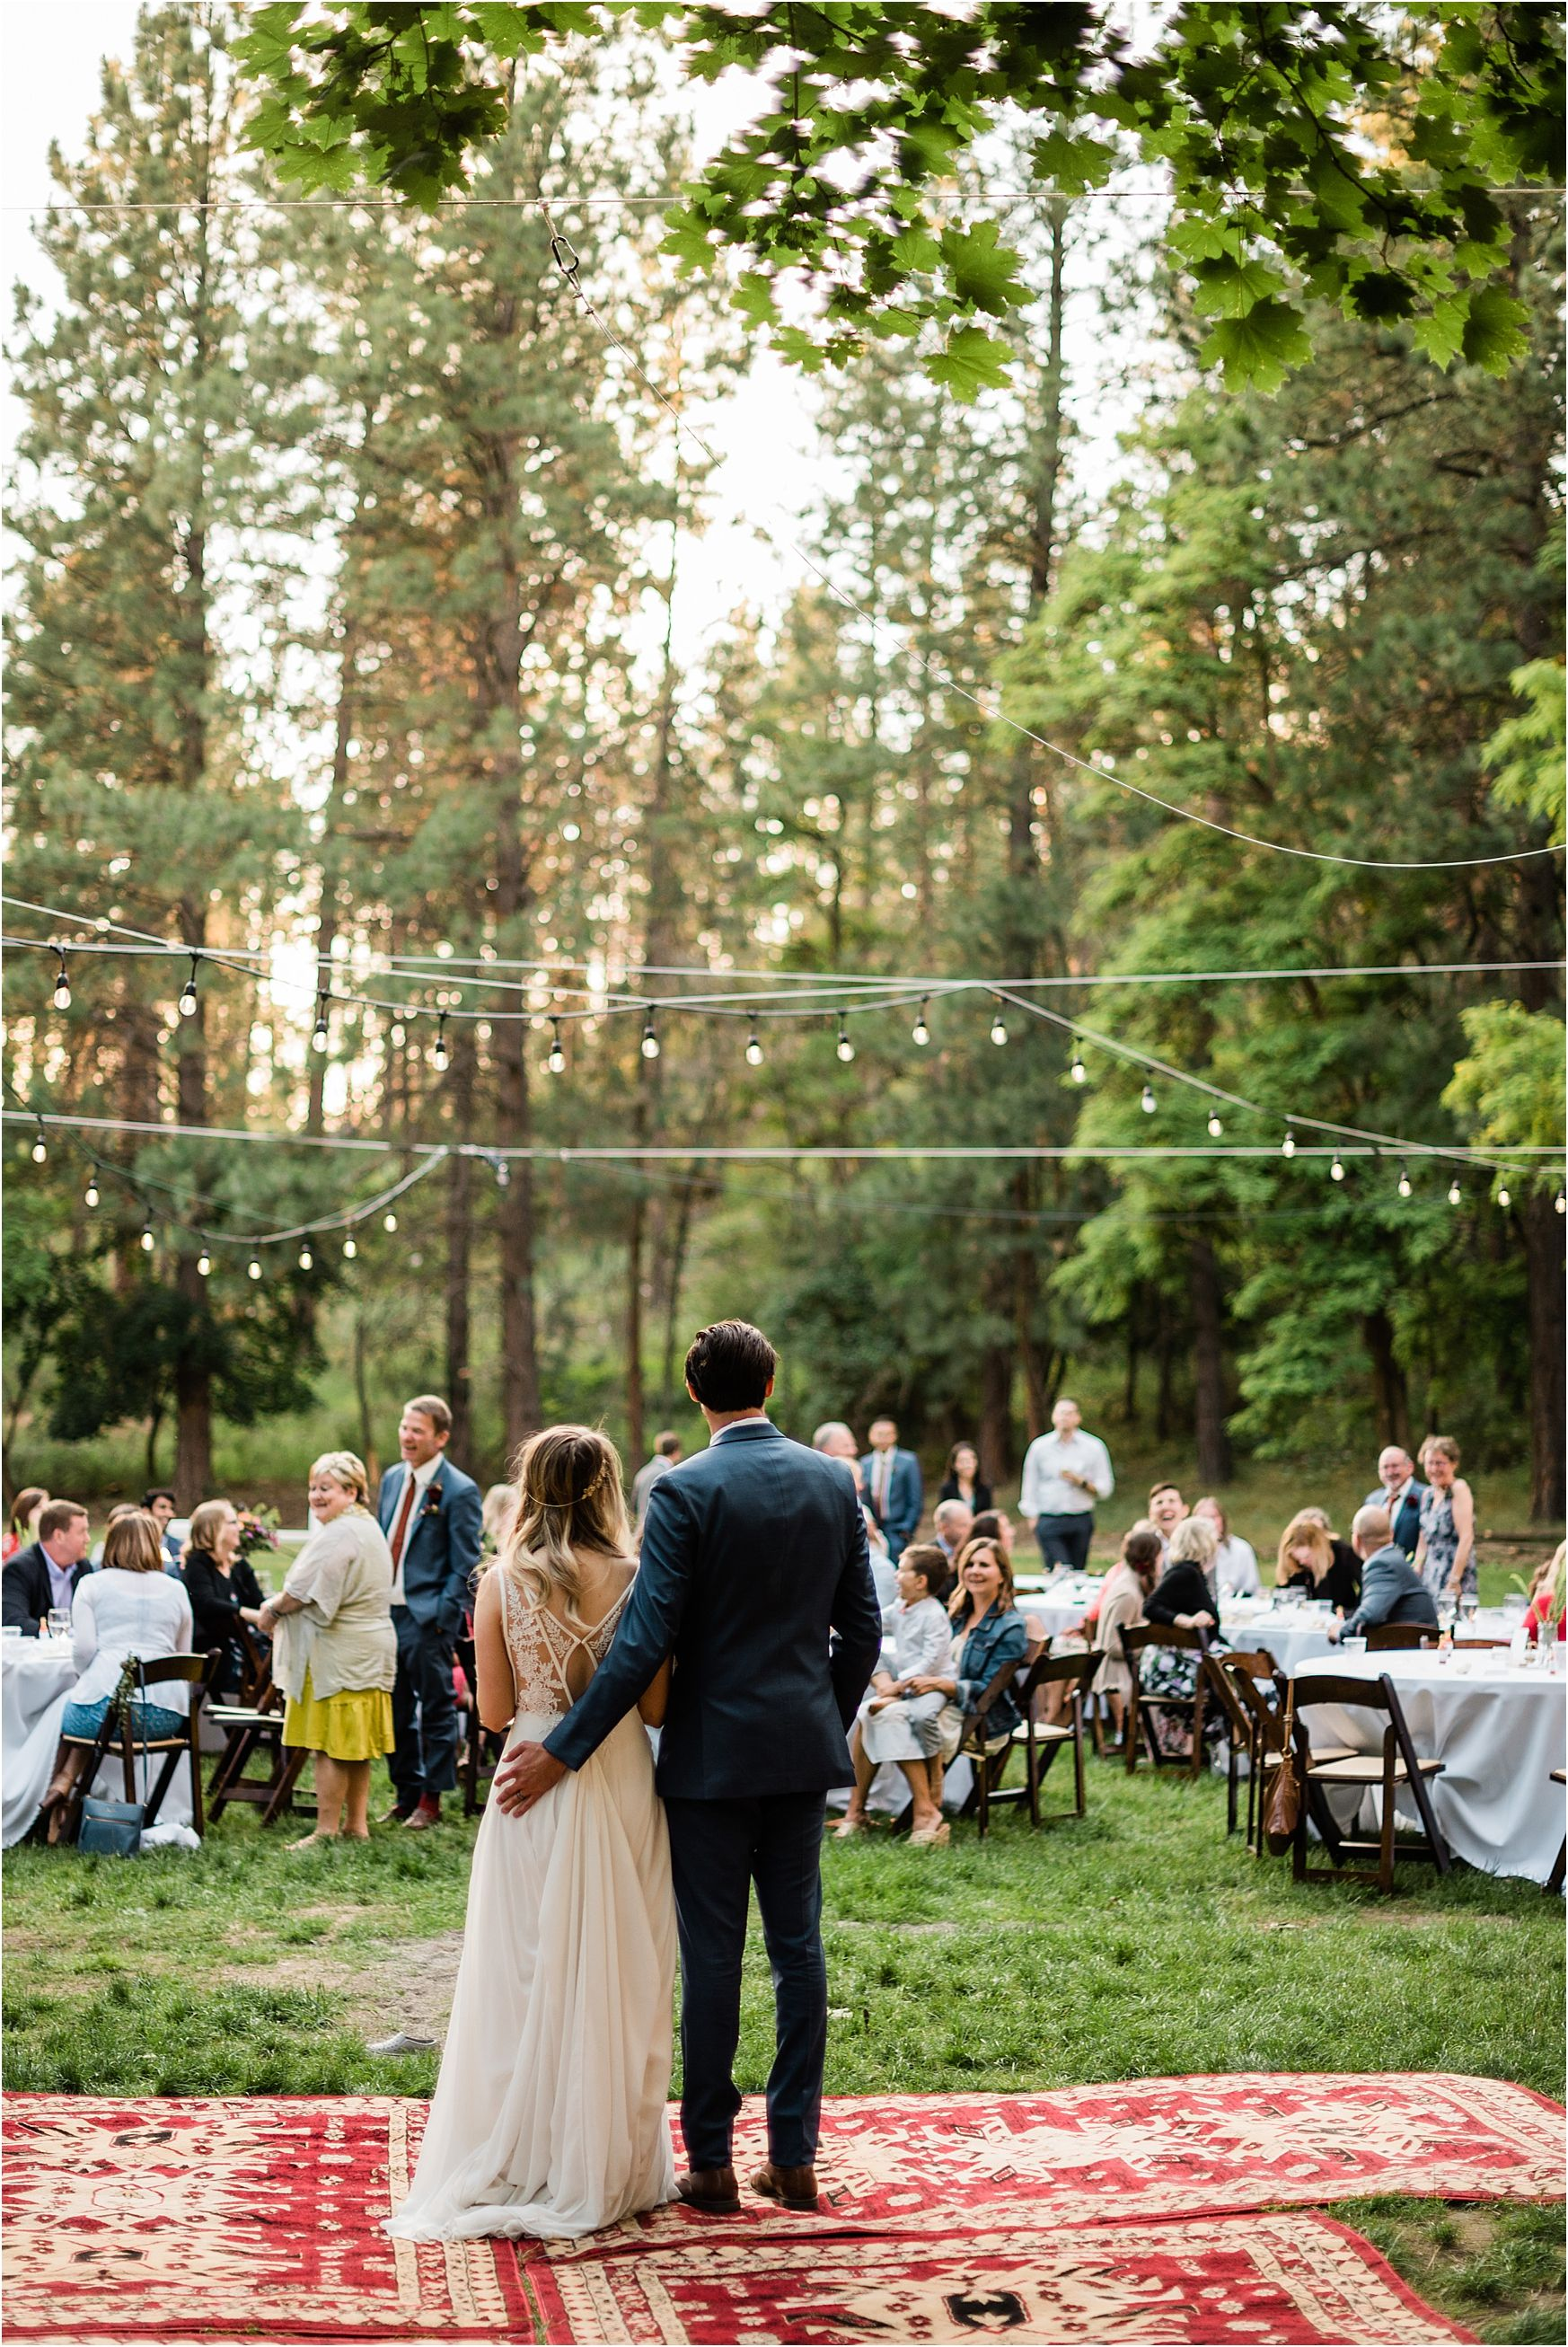 Woodsy Bright Minimalist Wedding At Zephyr Lodge Liberty Lake Liberty Lake Lodge Wedding Ceremony Inspiration